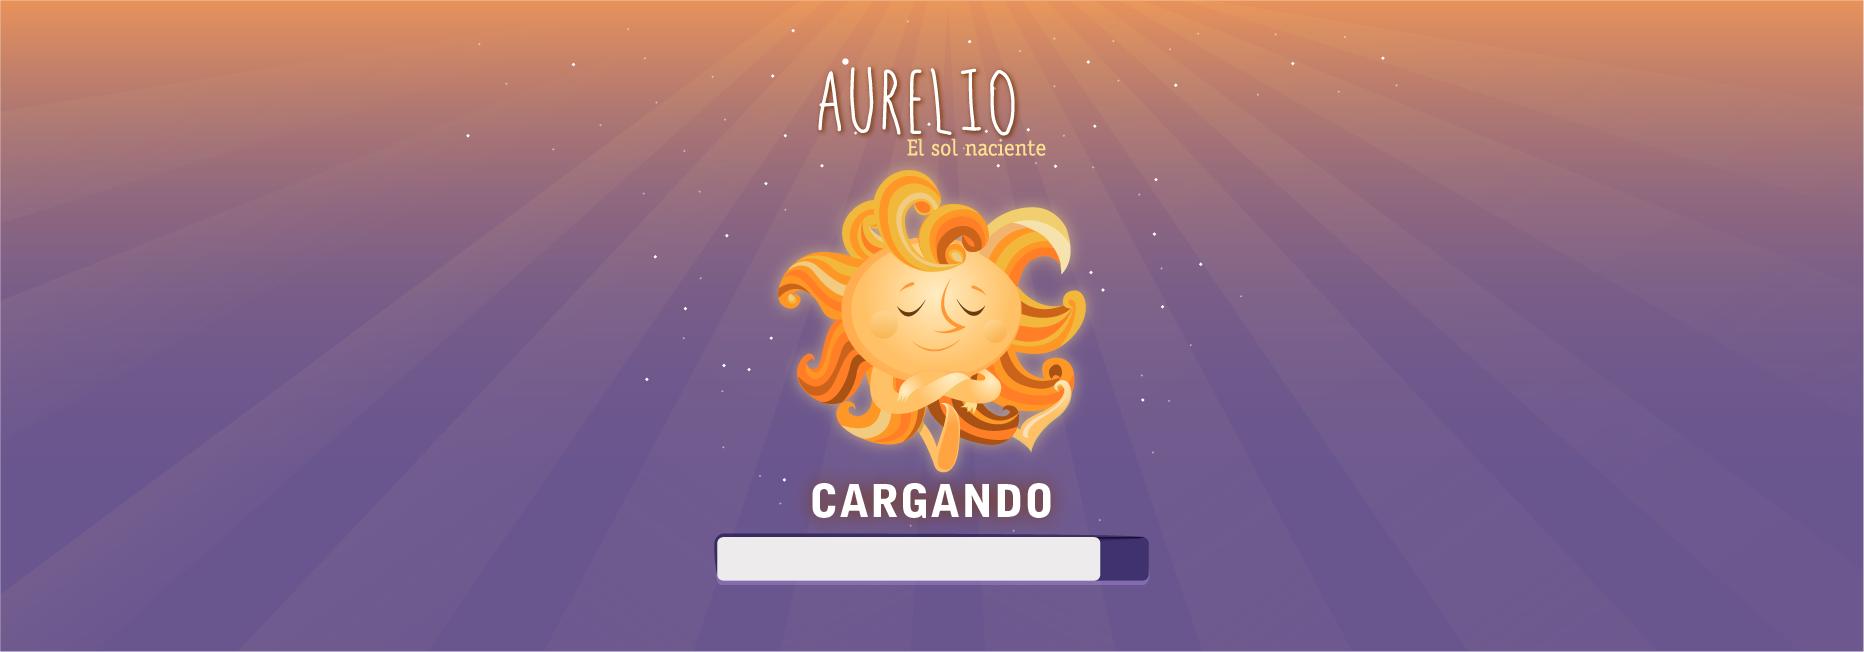 Lanzamiento Aurelio Banners-04